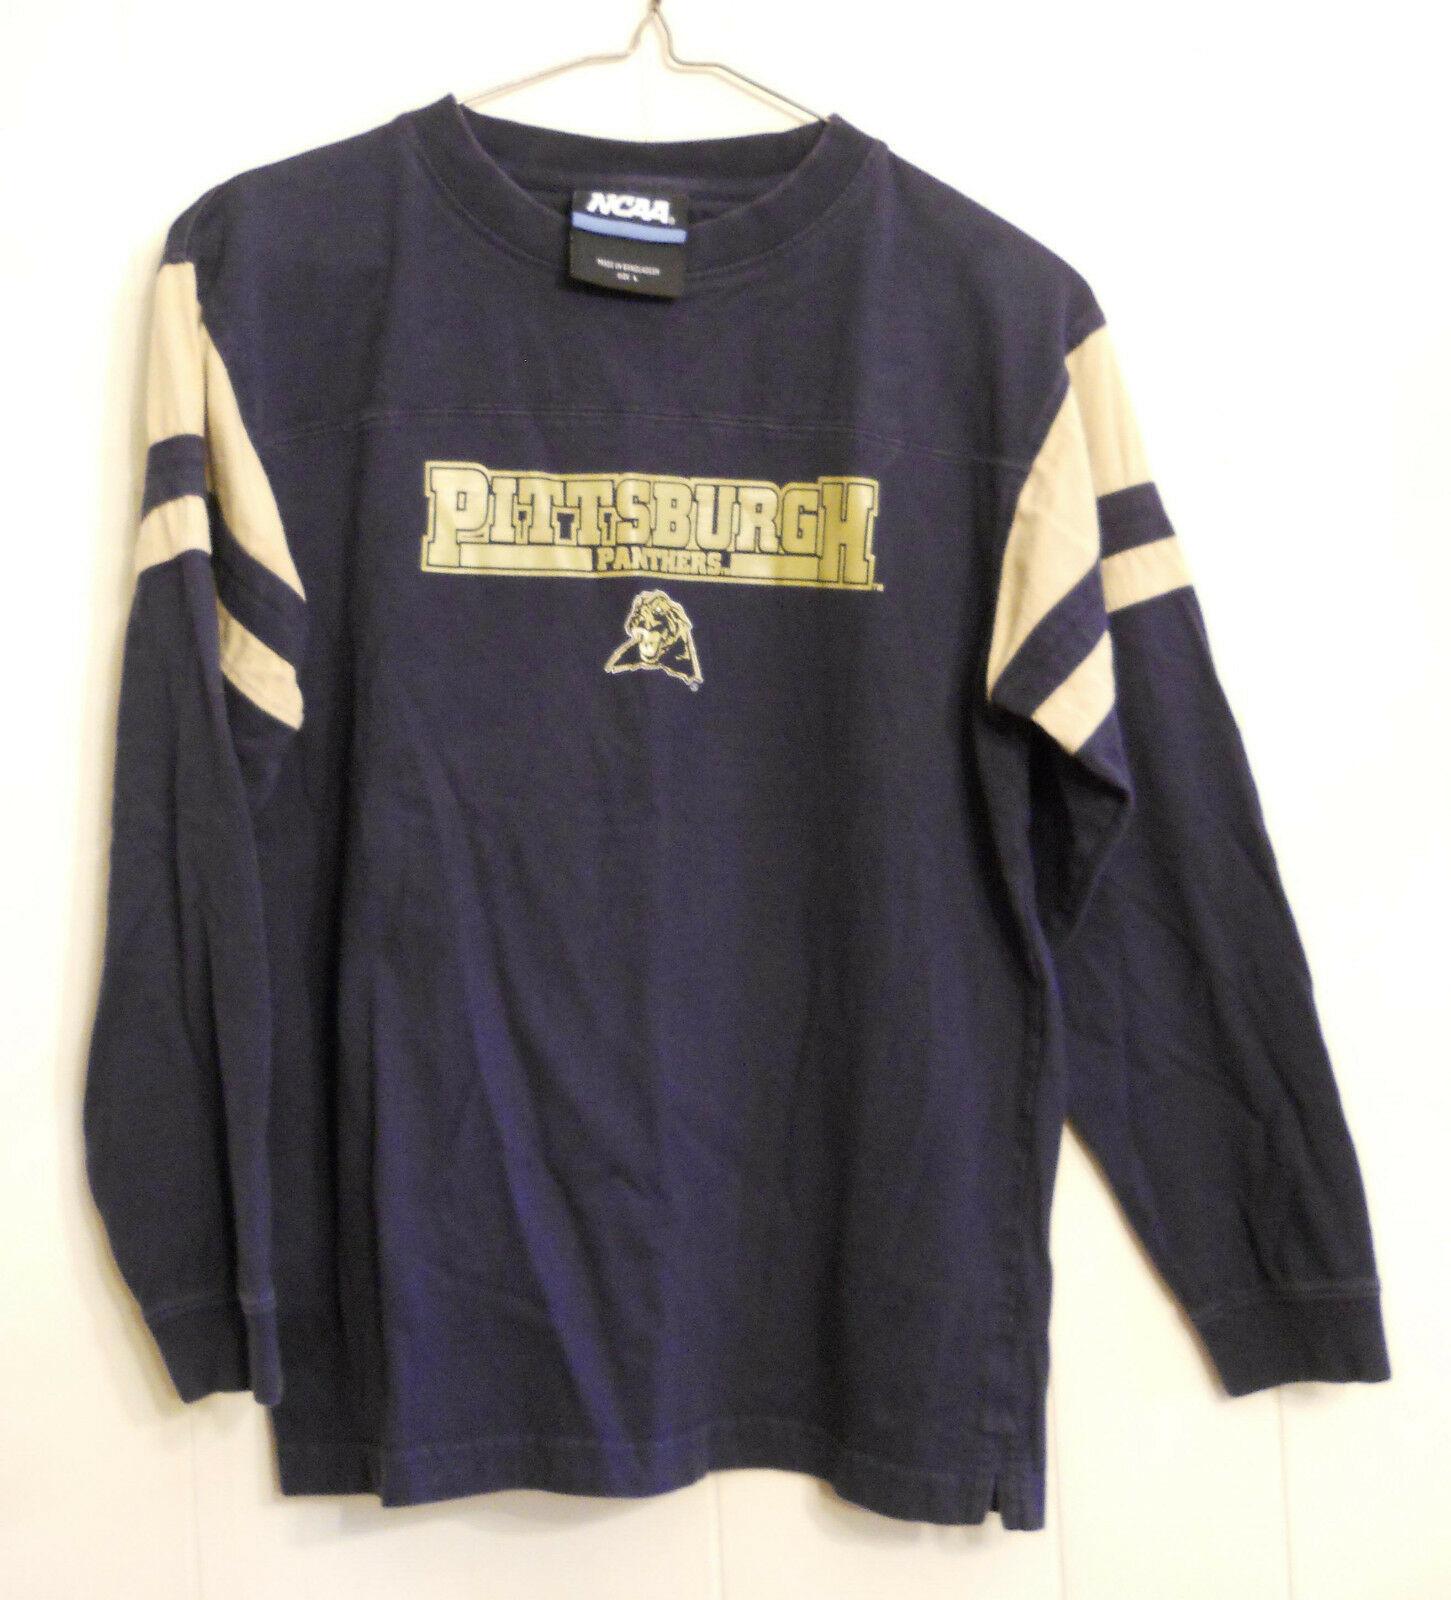 NCAA Pitt Panthers Youth Jersey Shirt Pittsburgh Basketball March Madness LARGE